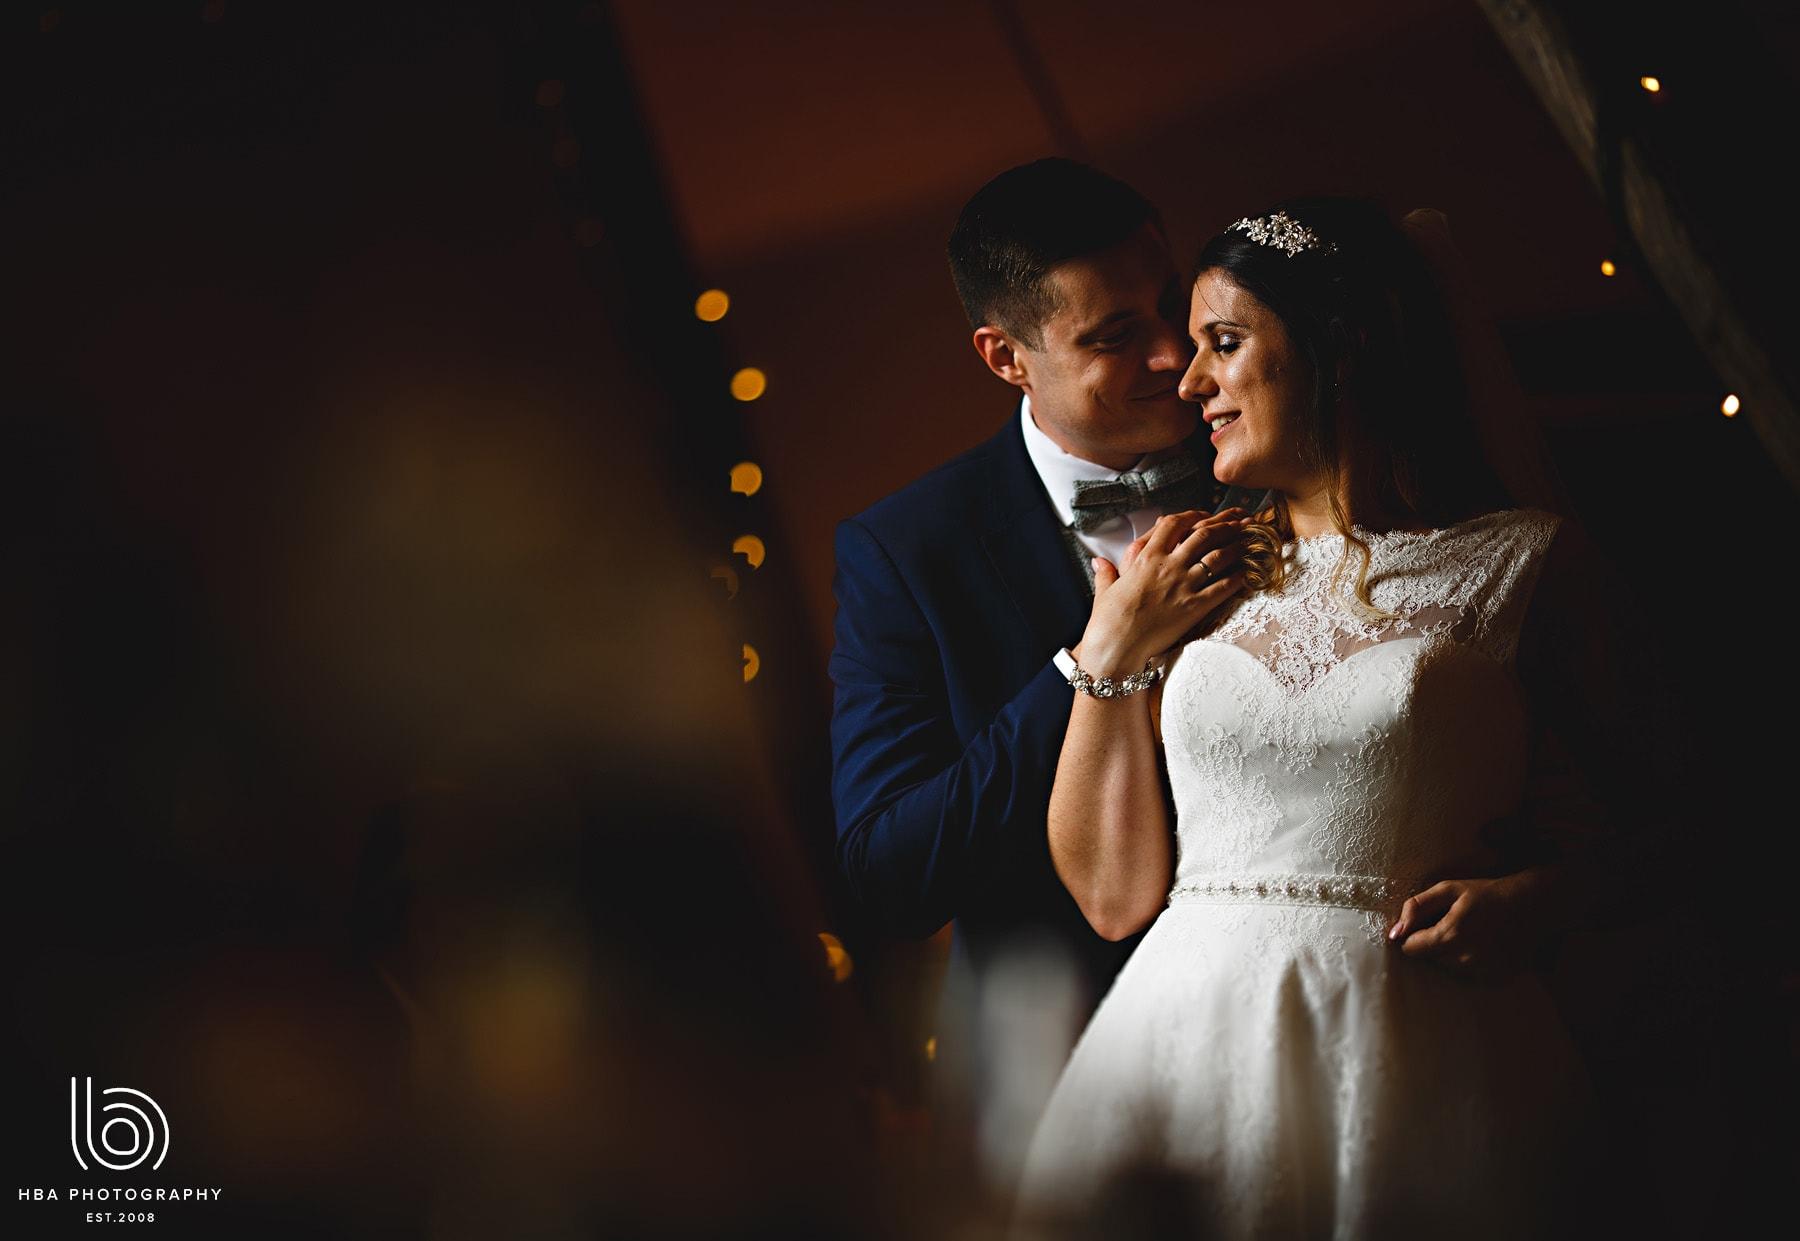 The bride & groom inside the tipi